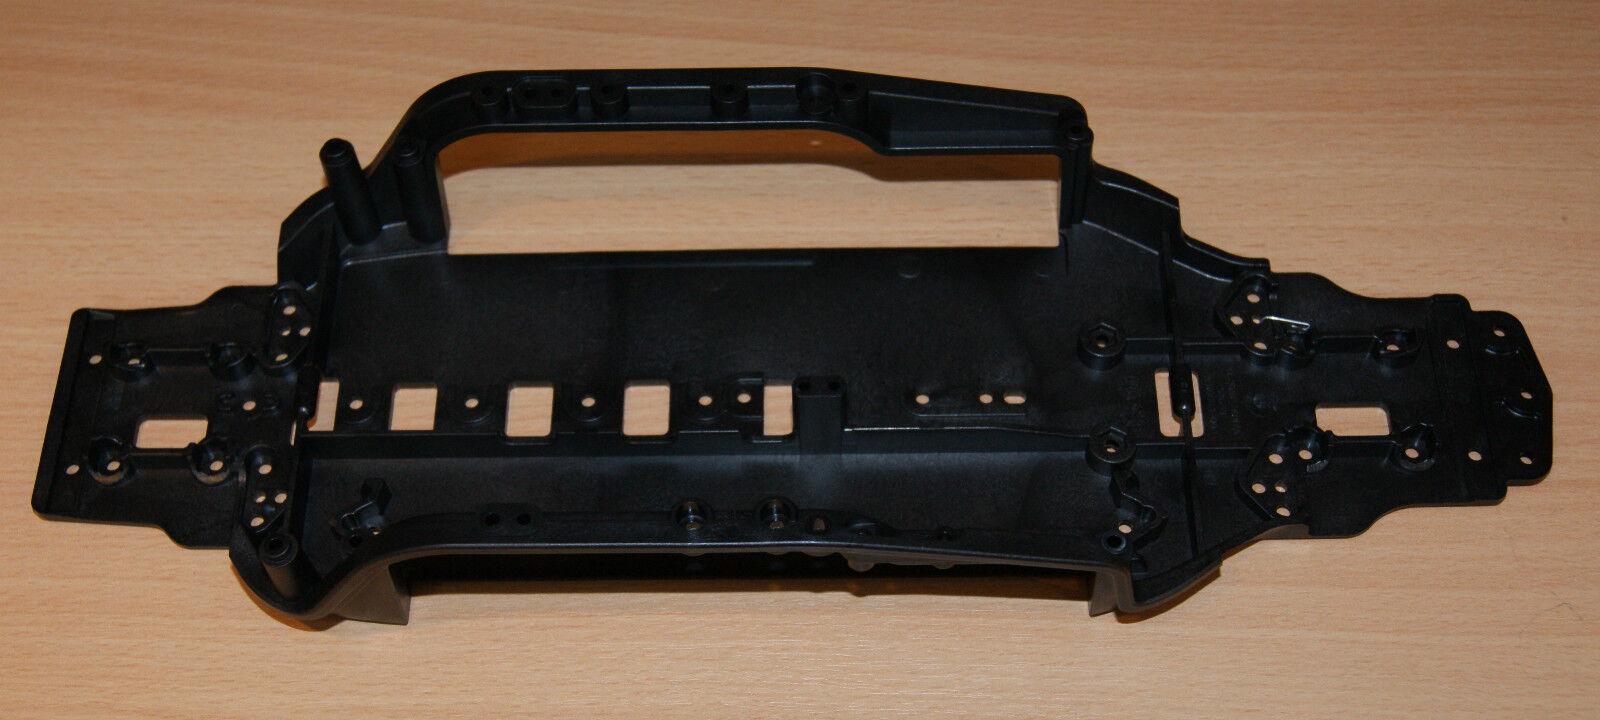 Tamiya 58636 ta07 pro - kit, 9335766   19335766 chassis   frame, neue